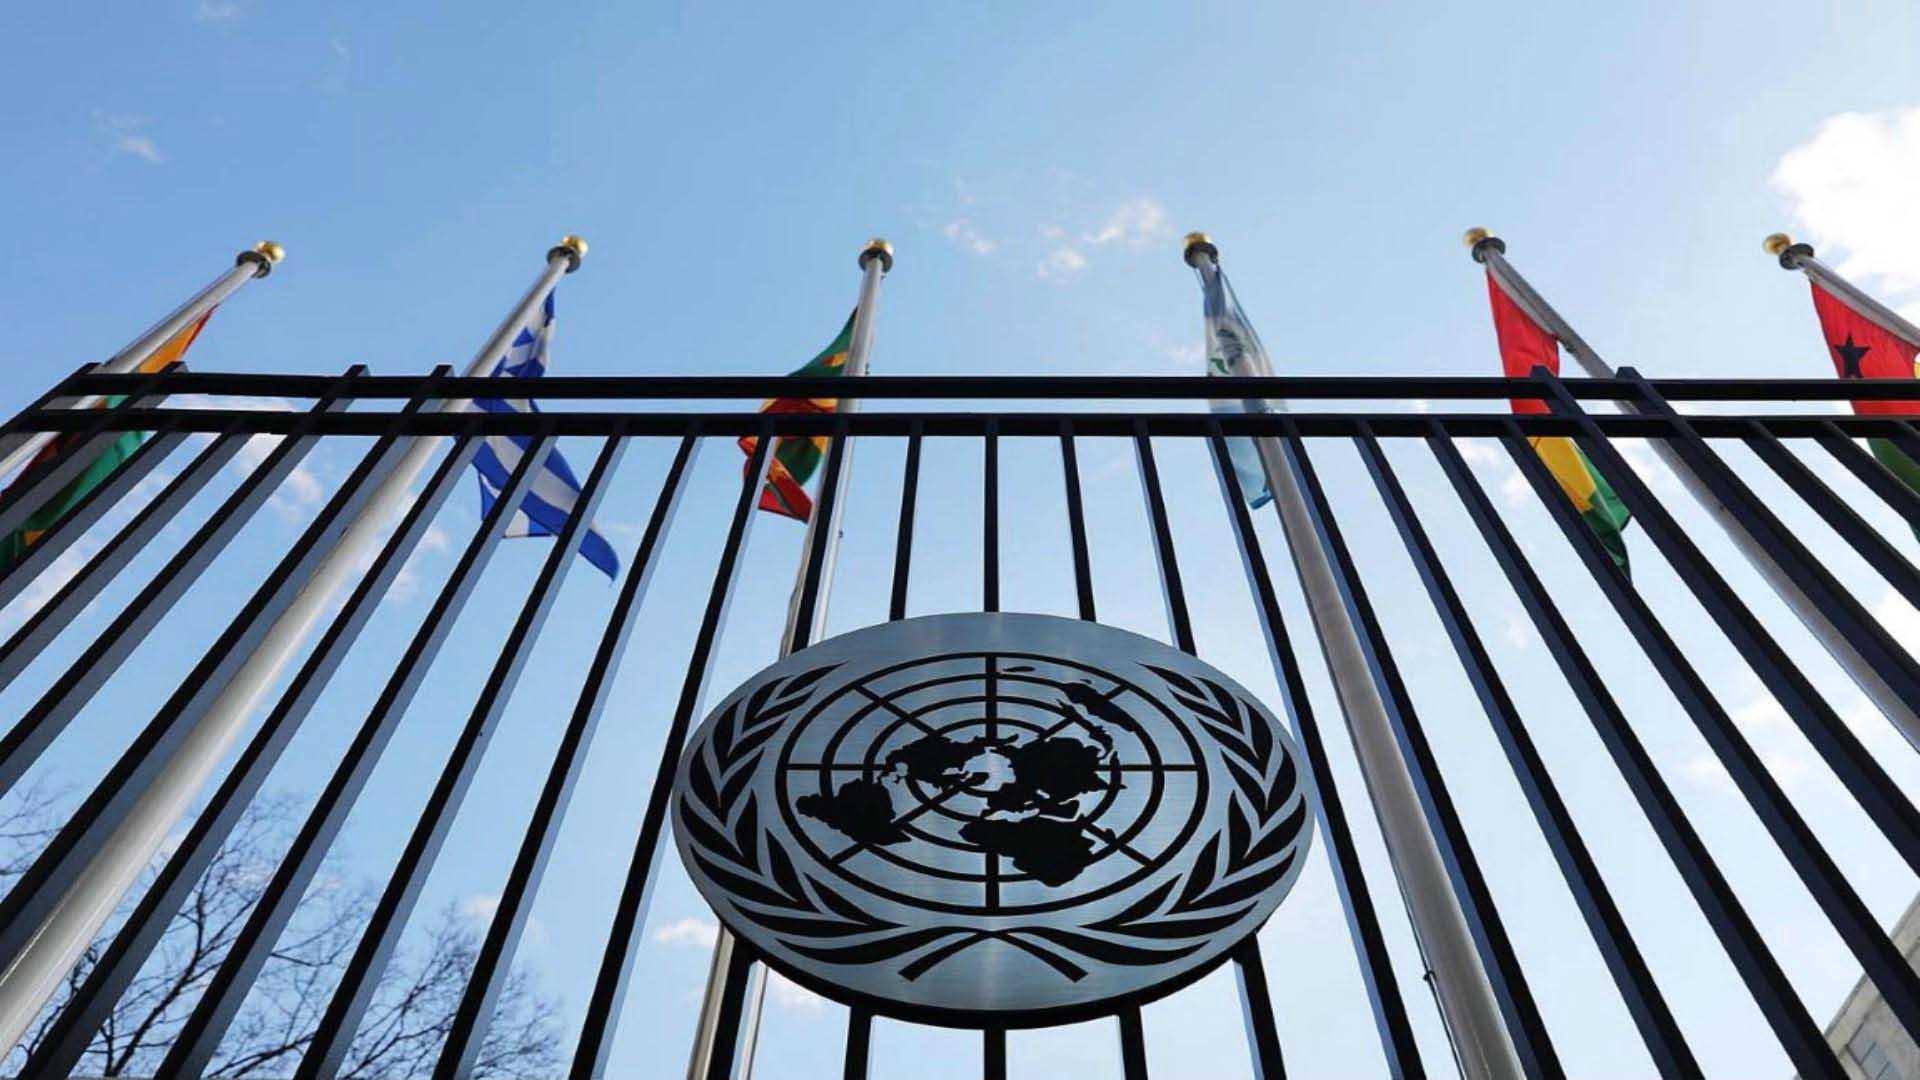 Doblellave-ONU solicitó investigación exhaustiva sobre muertes en Comandancia de Carabobo